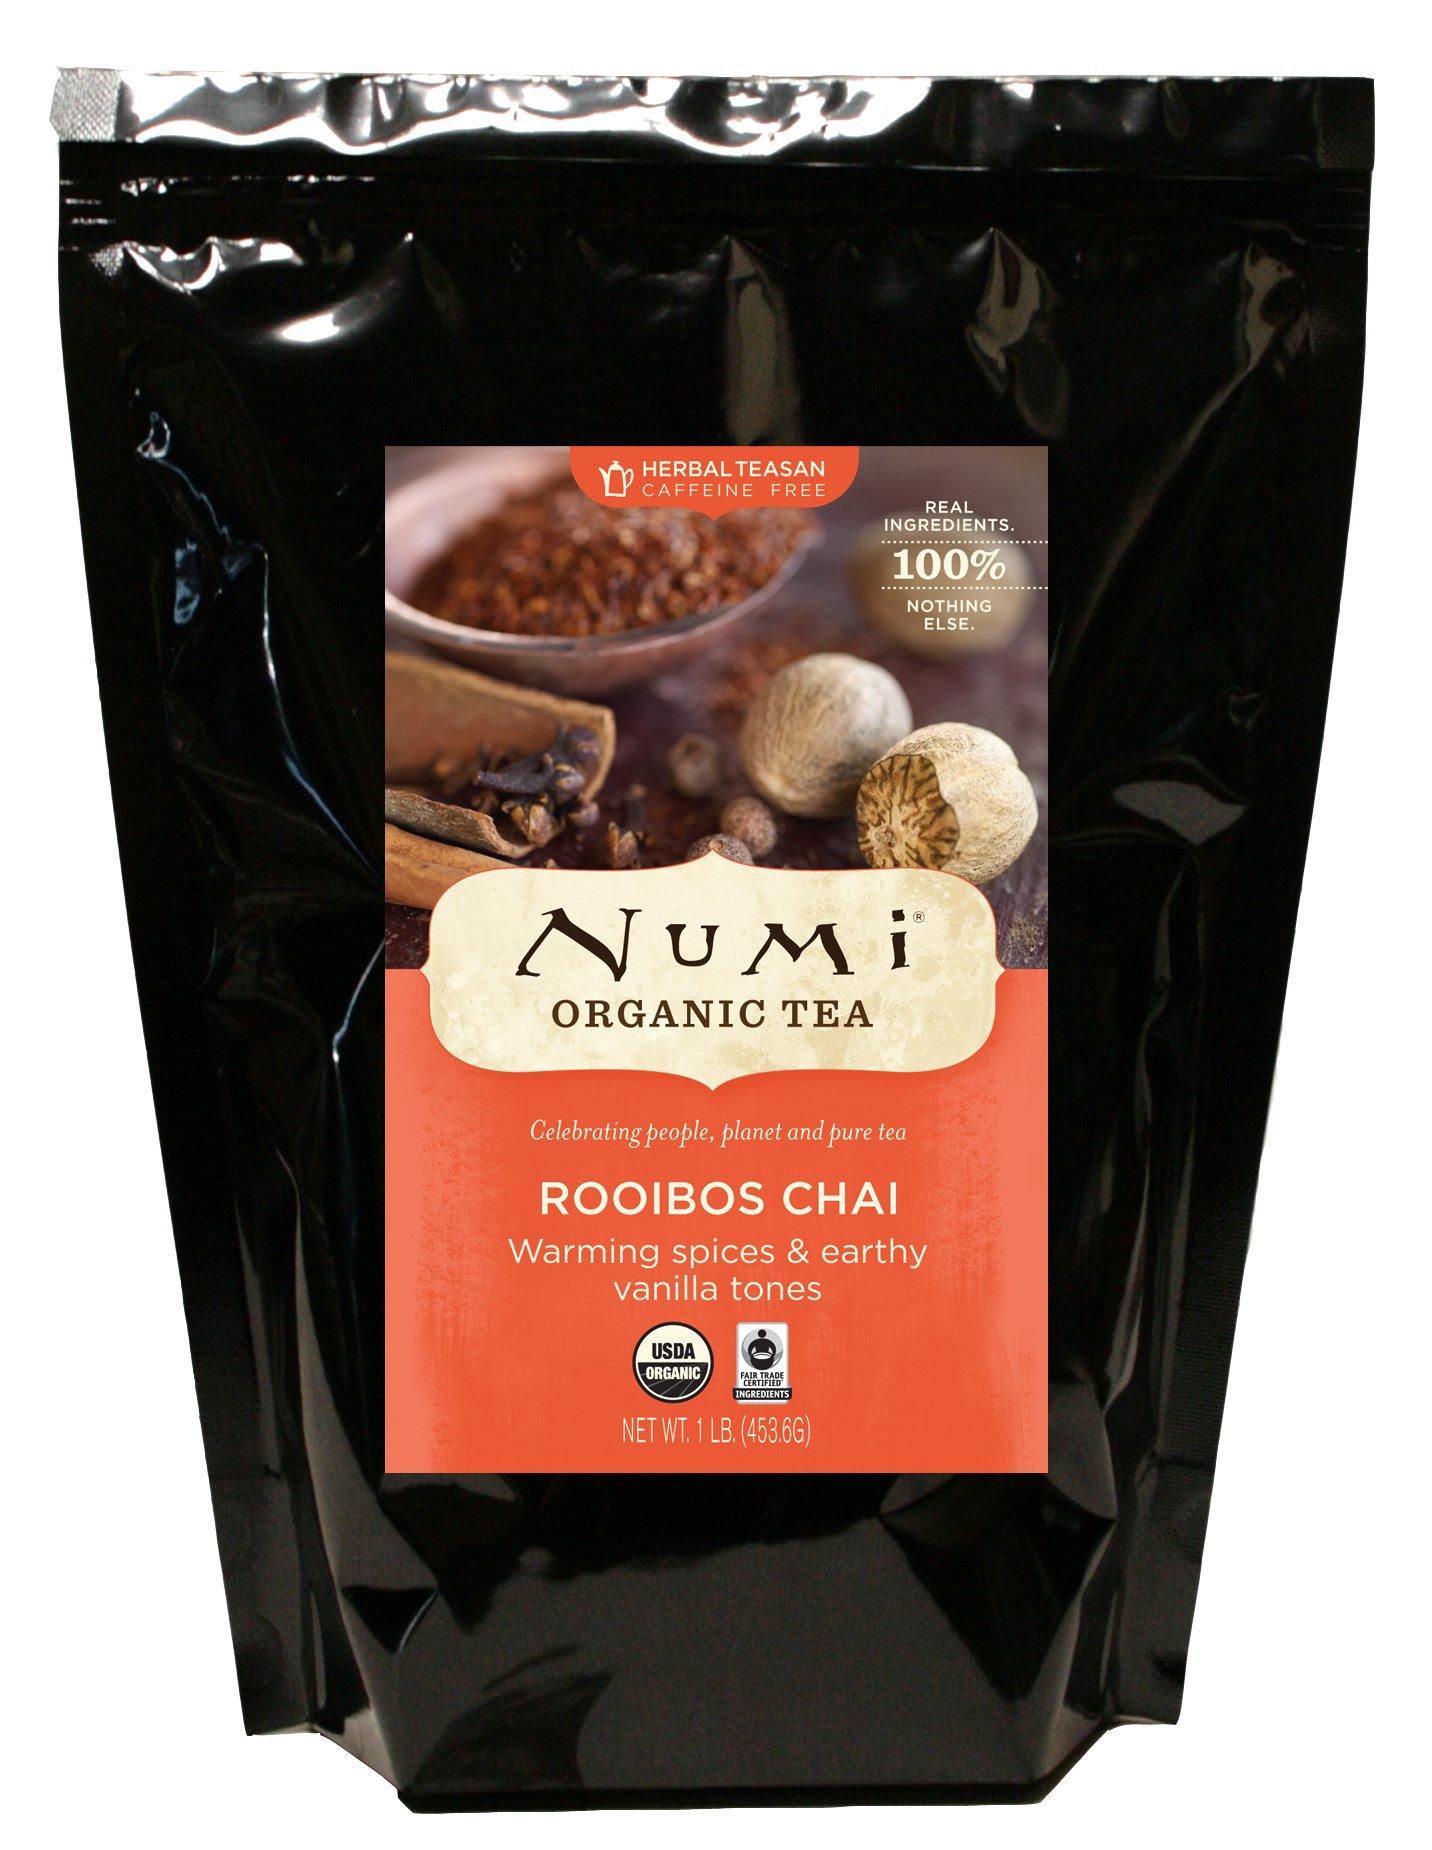 Numi Organic Tea Rooibos Chai, Caffeine Free Herbal Teasan, Loose Leaf, 16 Ounce Bulk Pouch